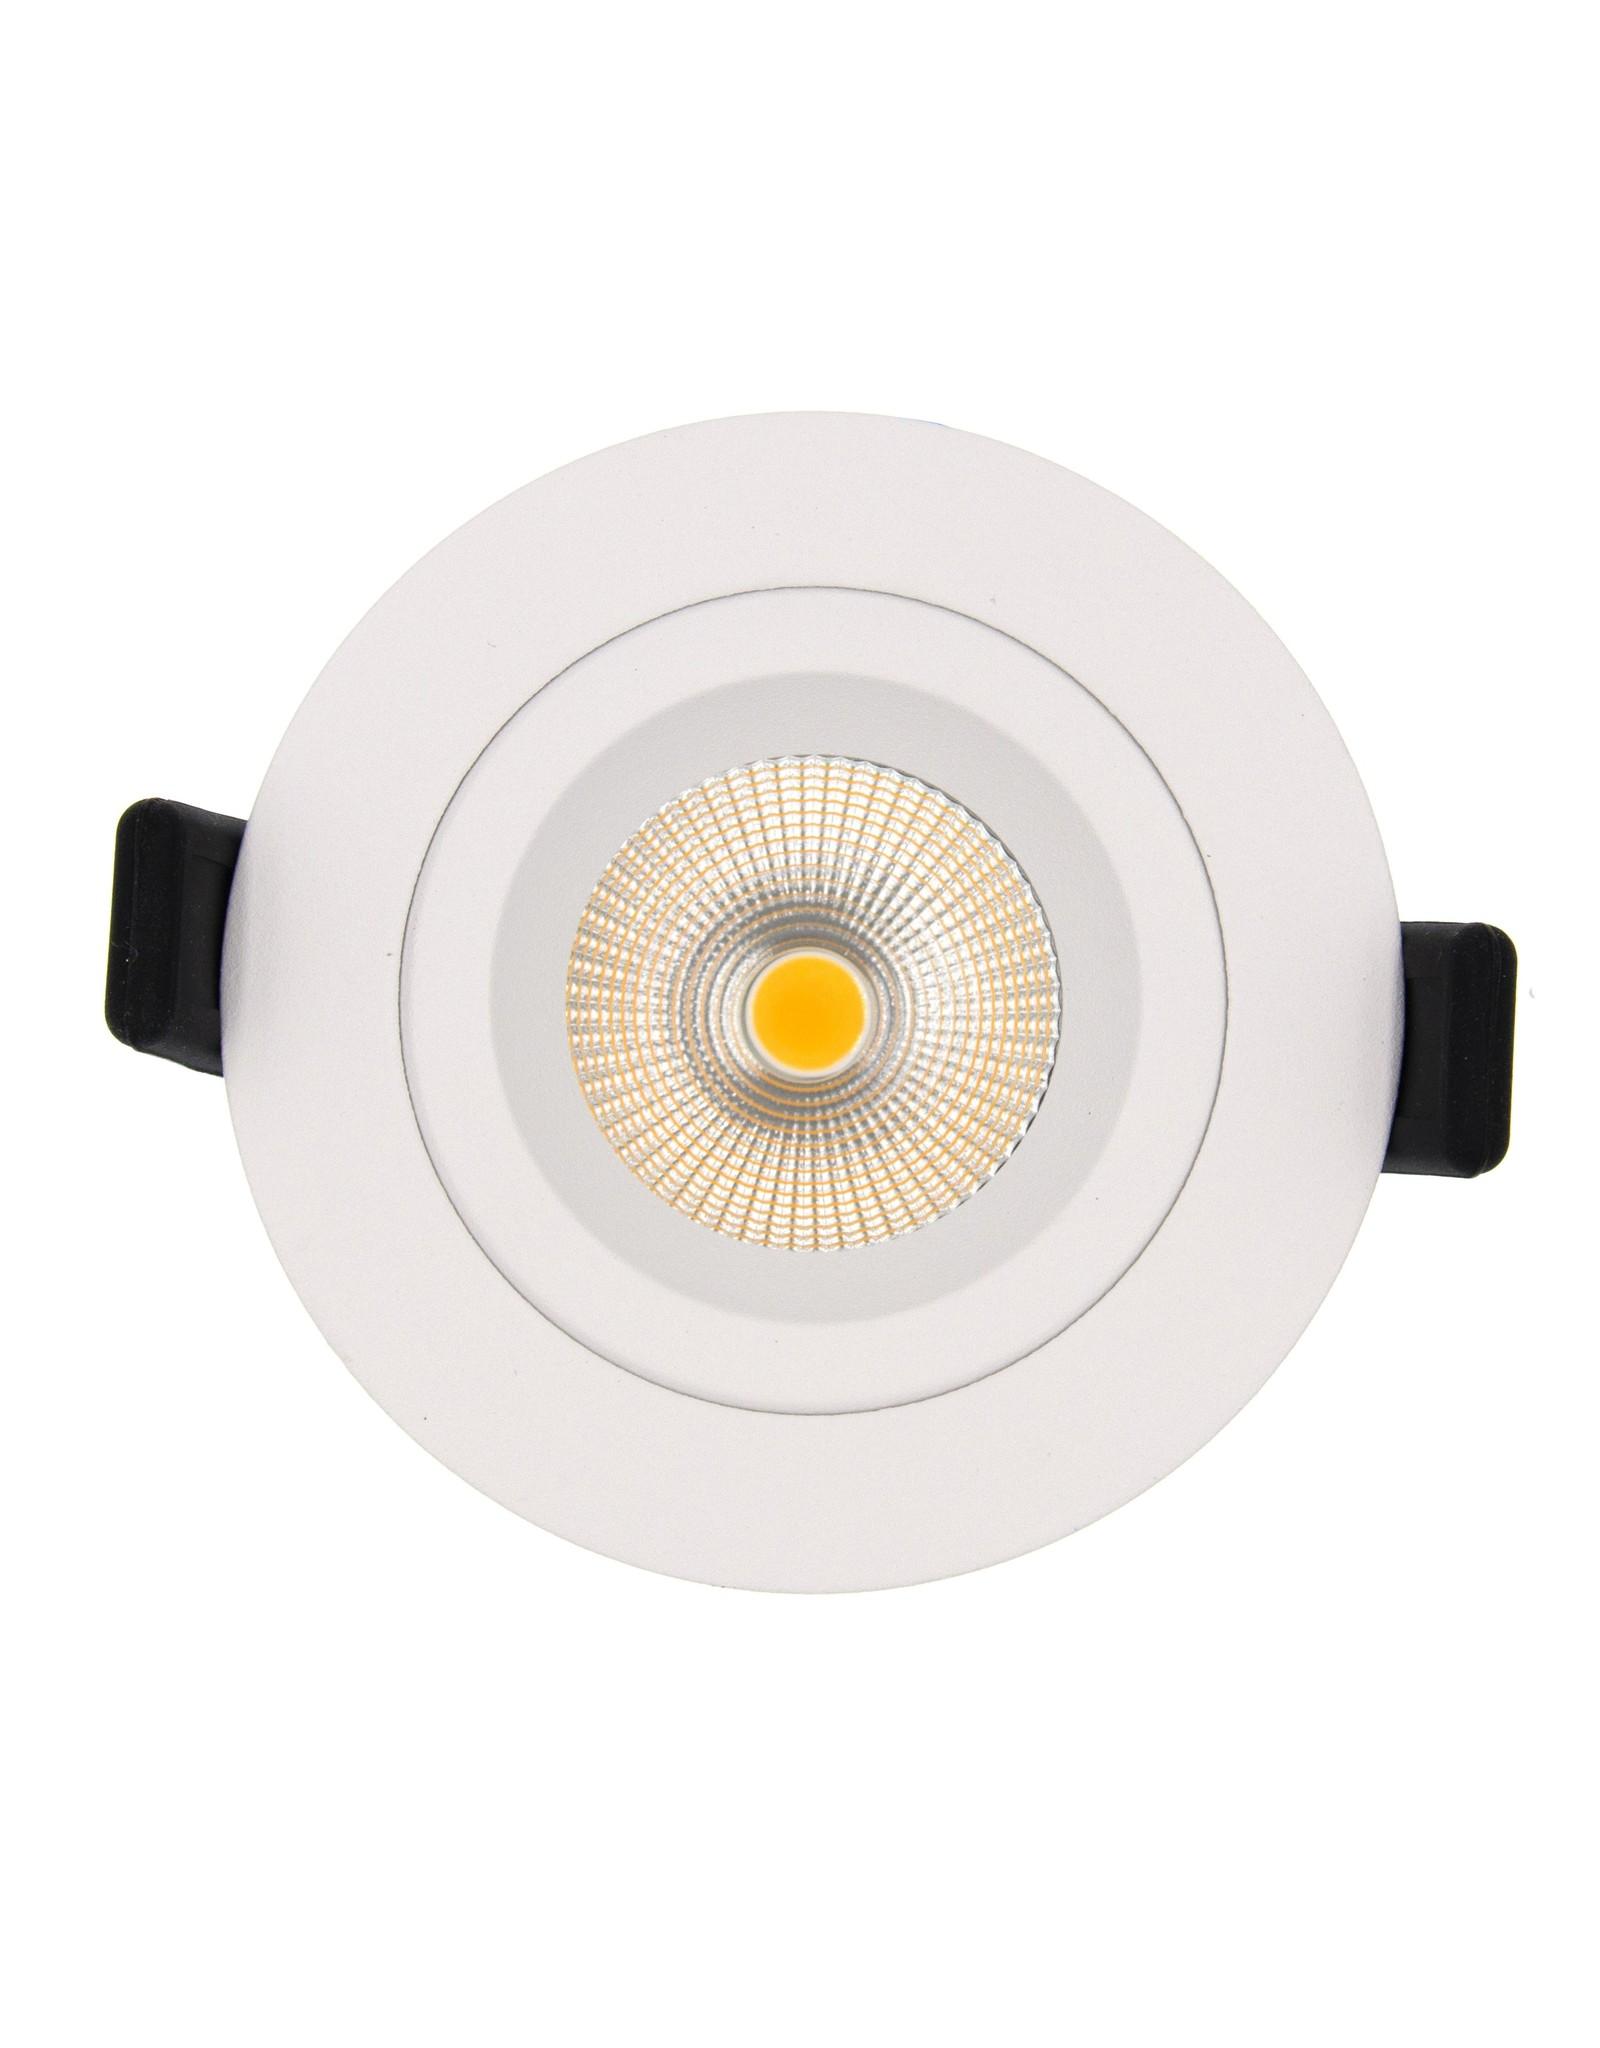 LedLed Tonny LED Kantelspot Rond Wit 2700k Dimbaar